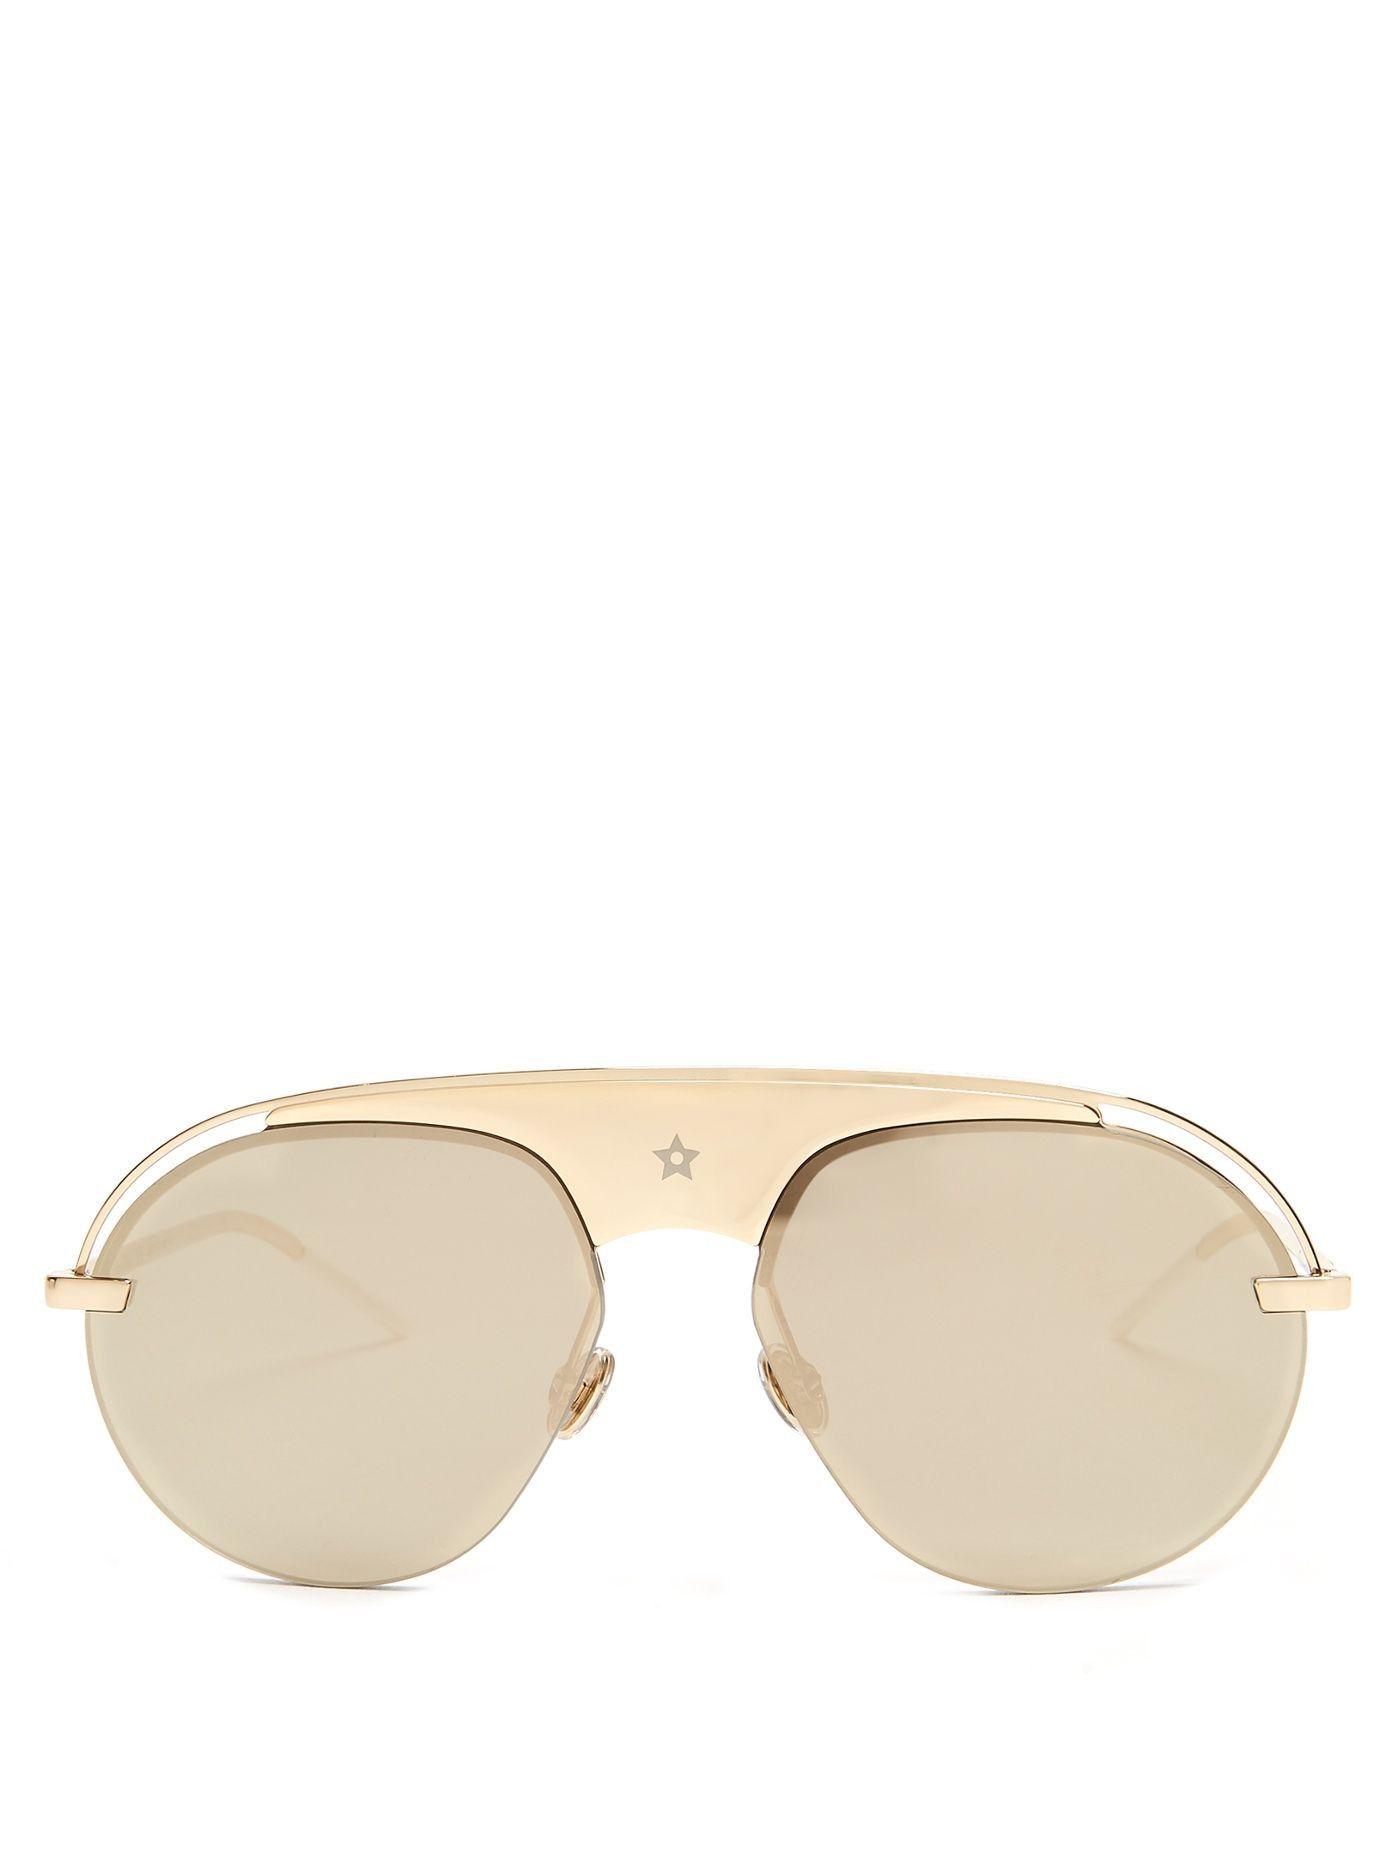 16 New Christian Dior Aviator Sunglasses Suggestions Christian